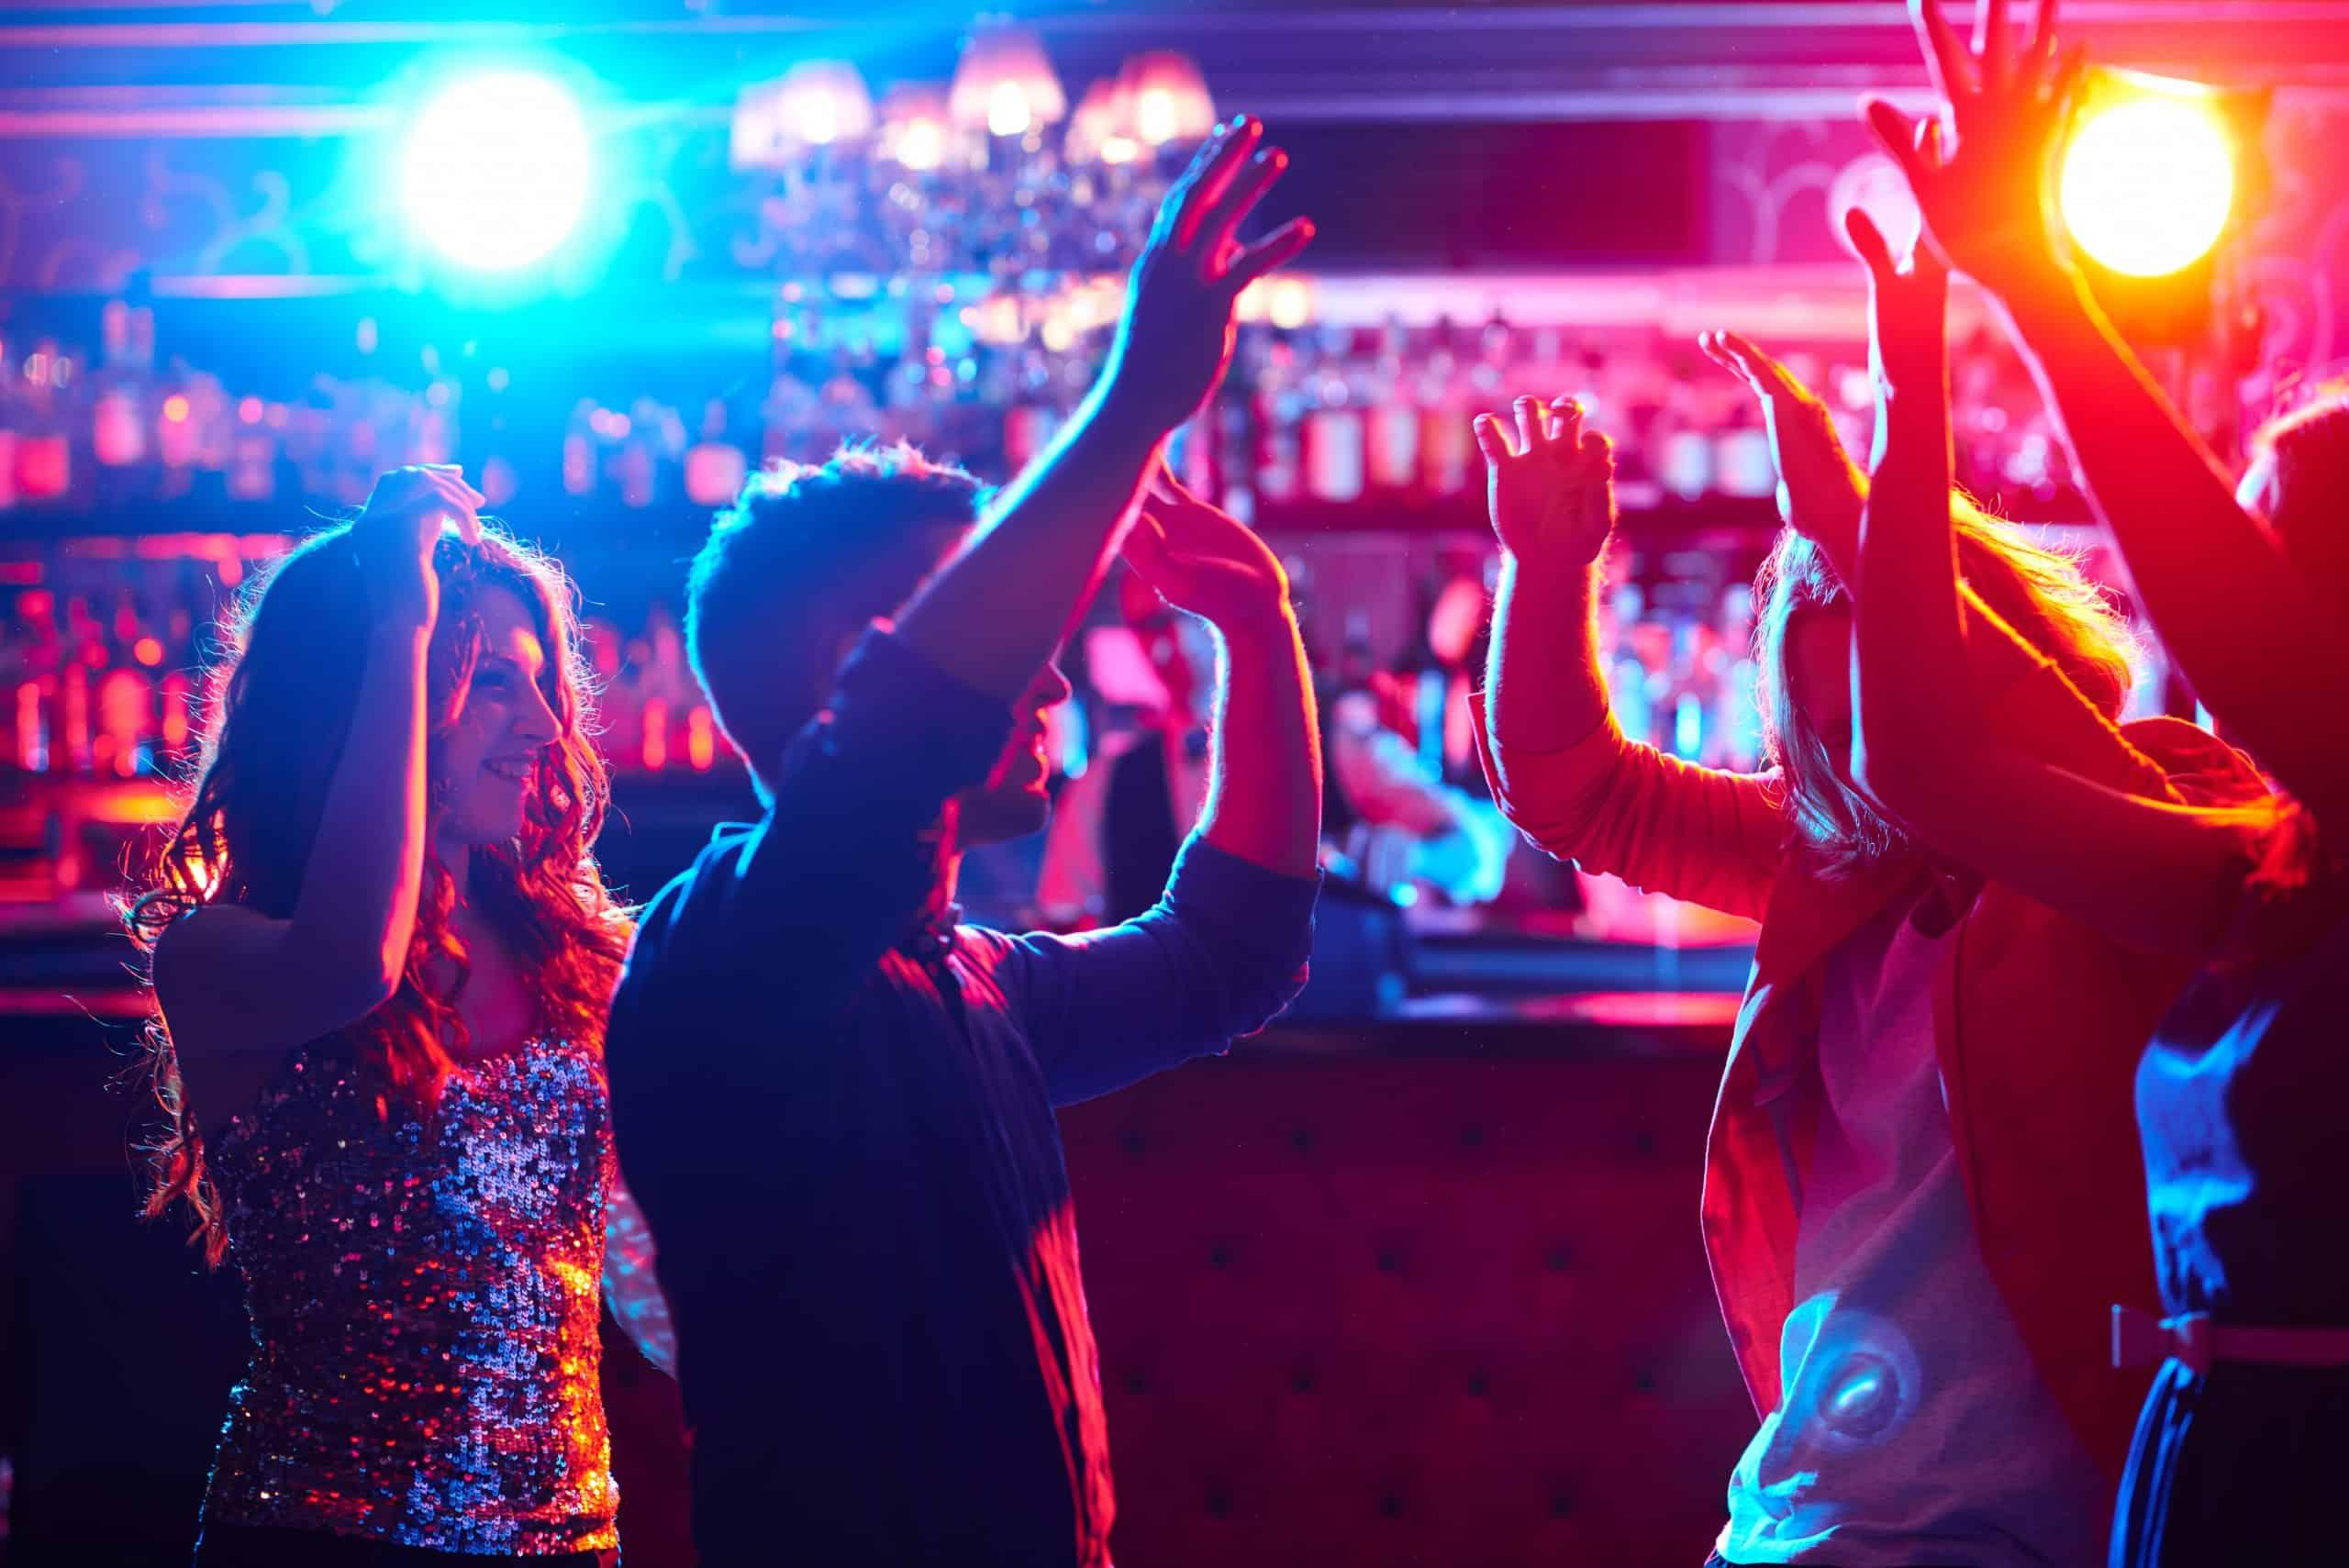 Nightclub_shutterstock-scaled